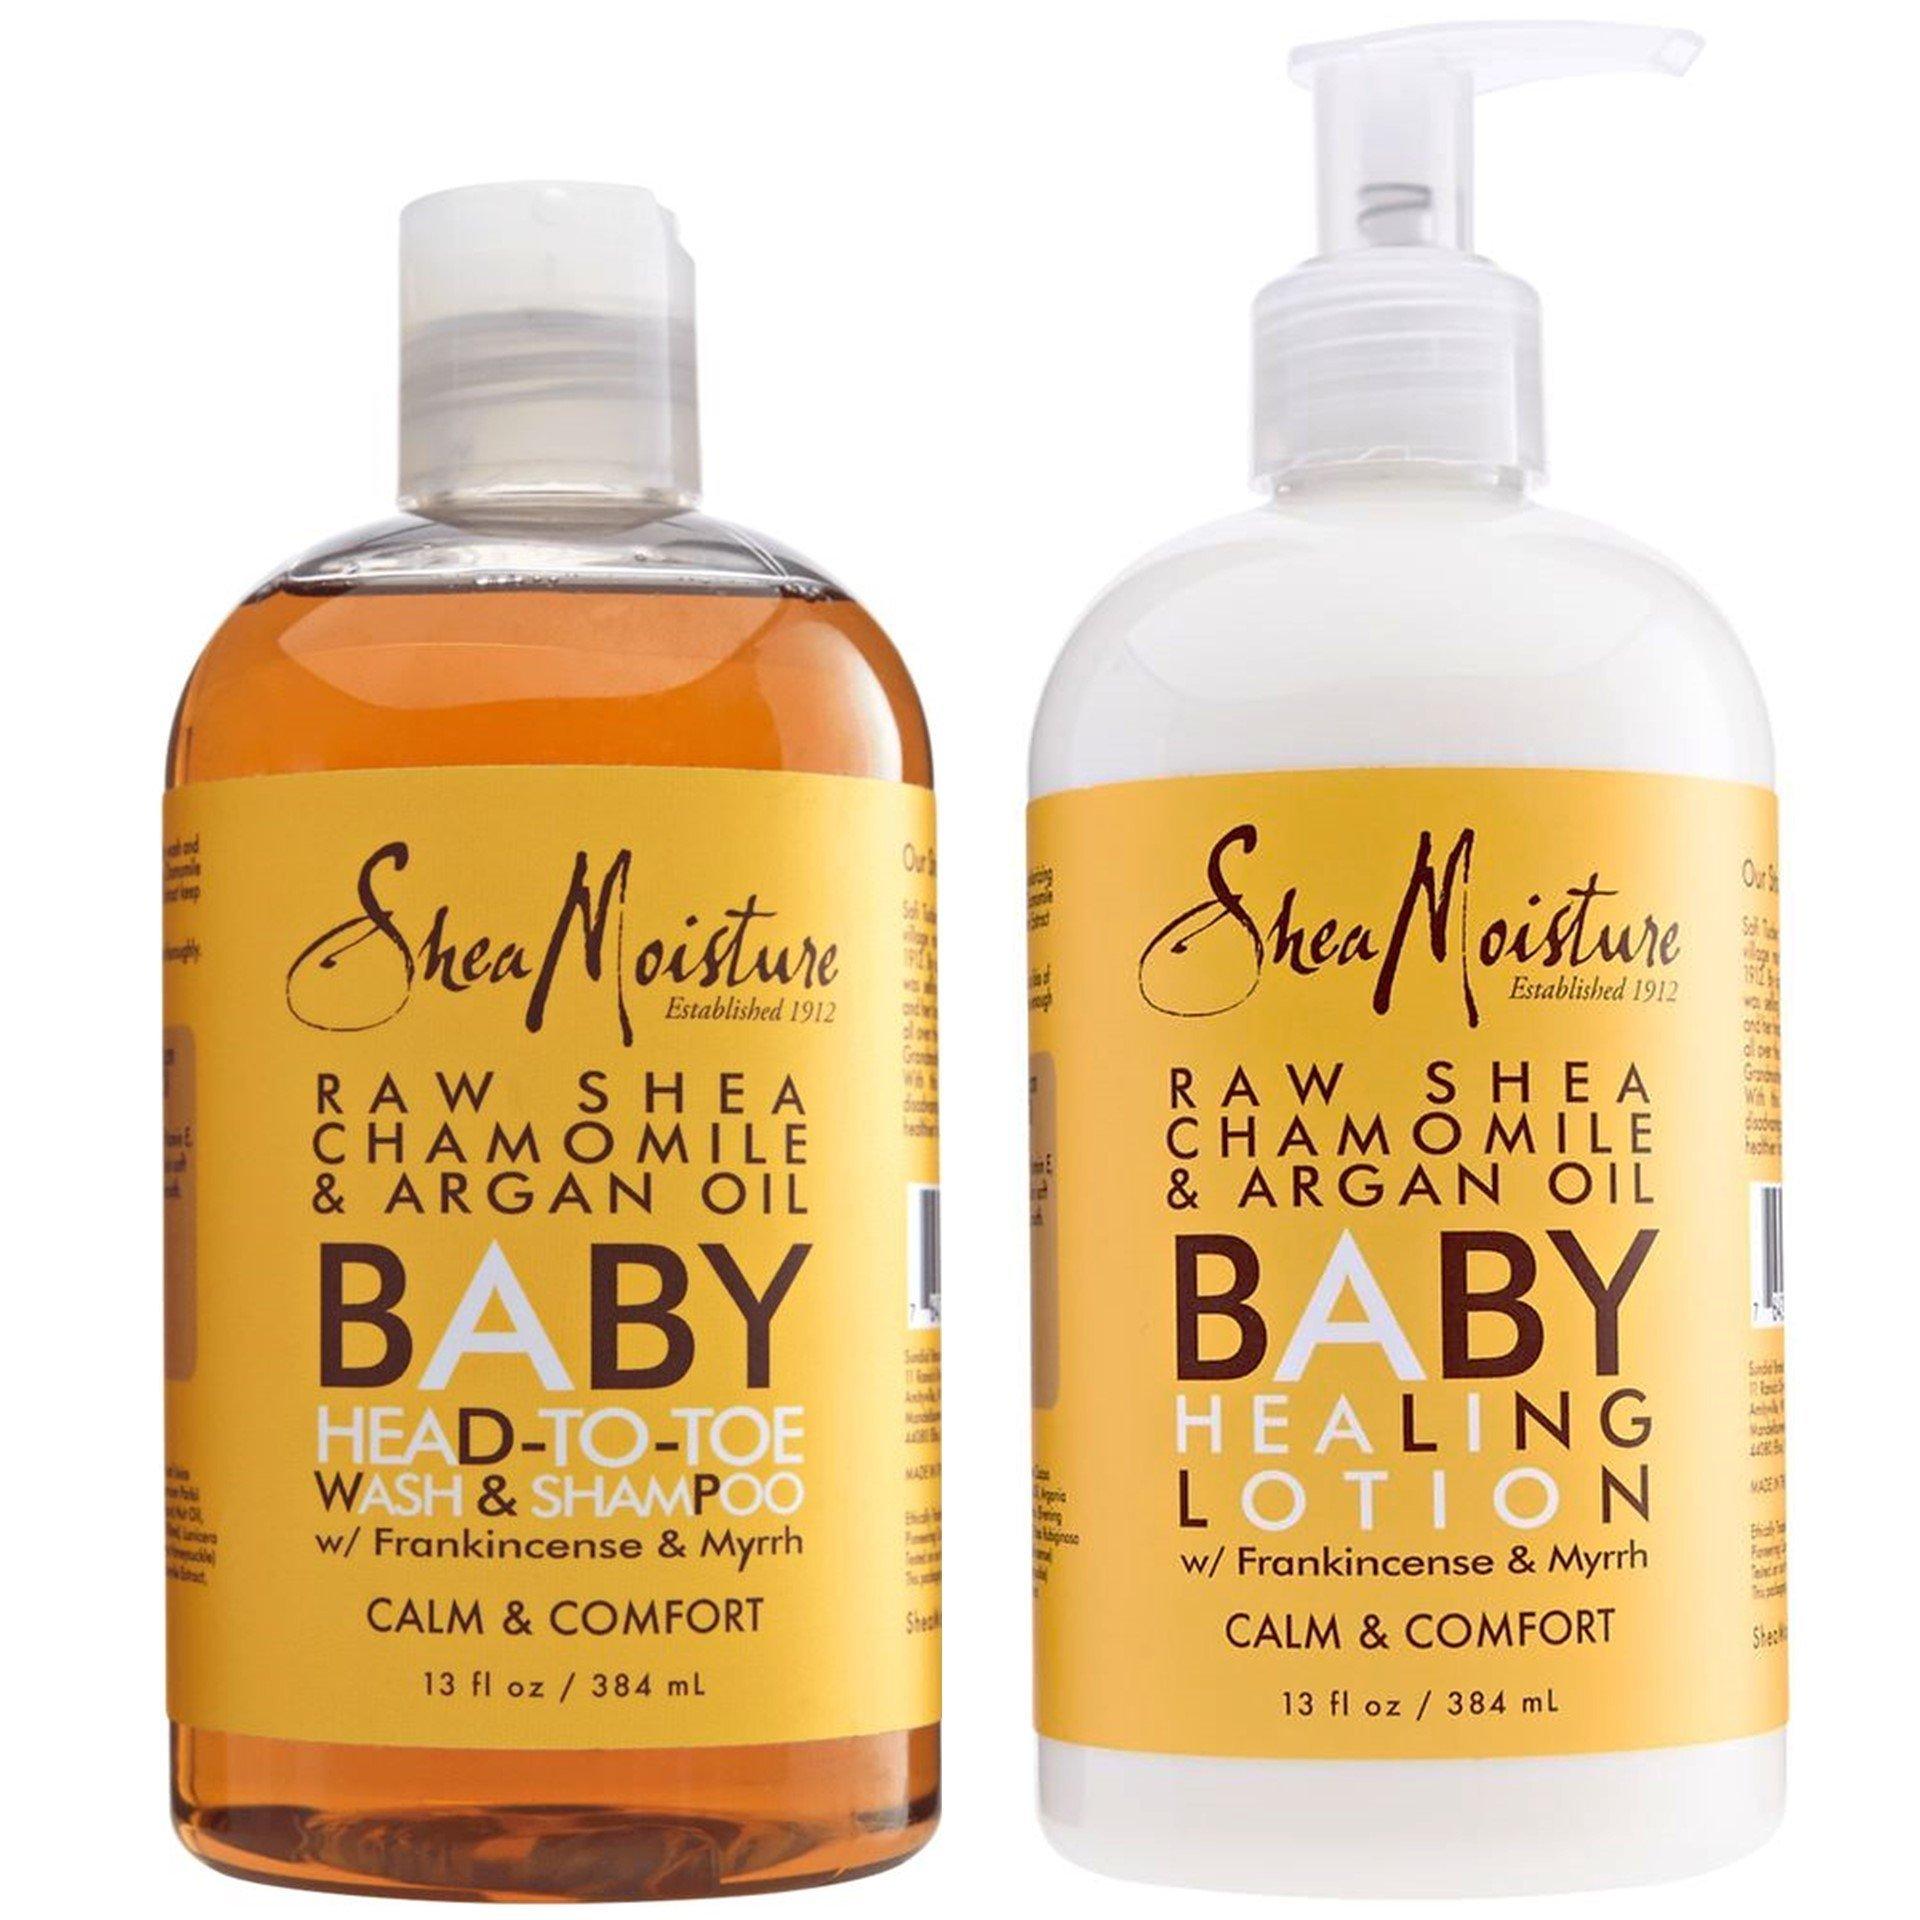 Shea Moisture Calm and Comfort Raw Shea Chamomile and Argan Oil Baby Head to Toe Wash Shampoo and Healing Lotion, 13 fl oz Each by Shea Moisture